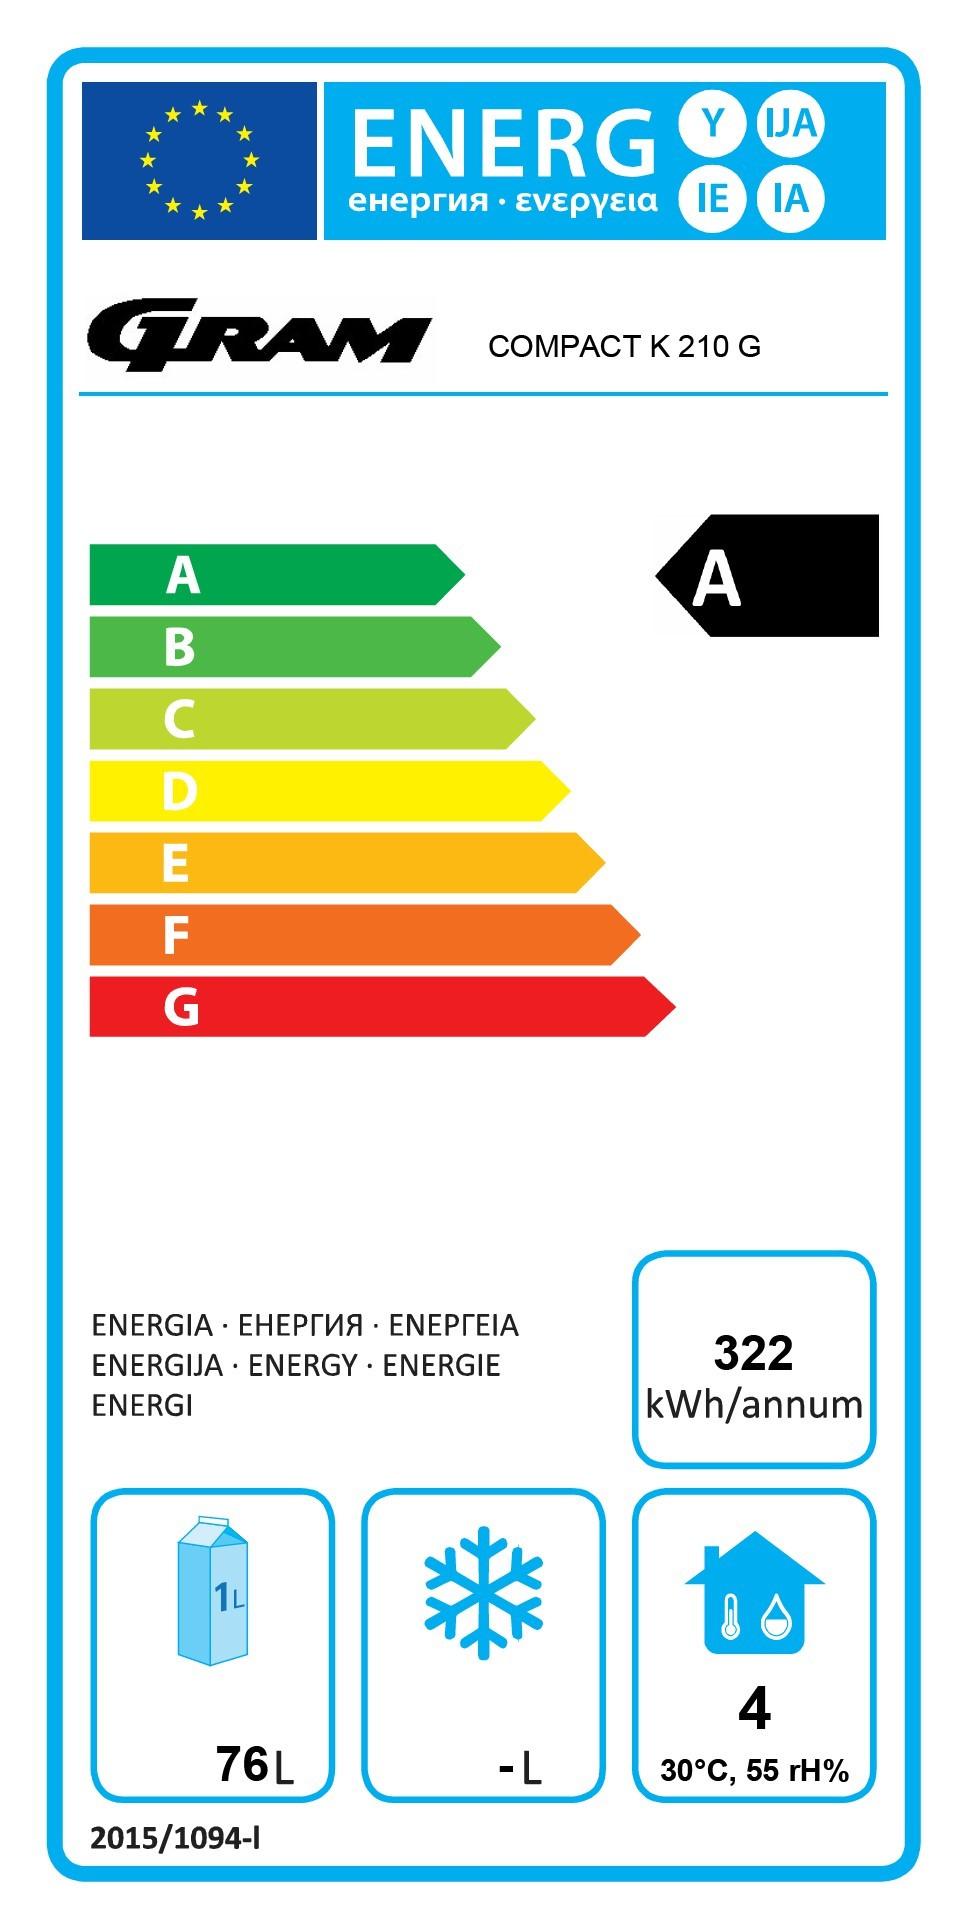 COMPACT K 220 LG 2W 128 Ltr Undercounter Fridge Energy Rating